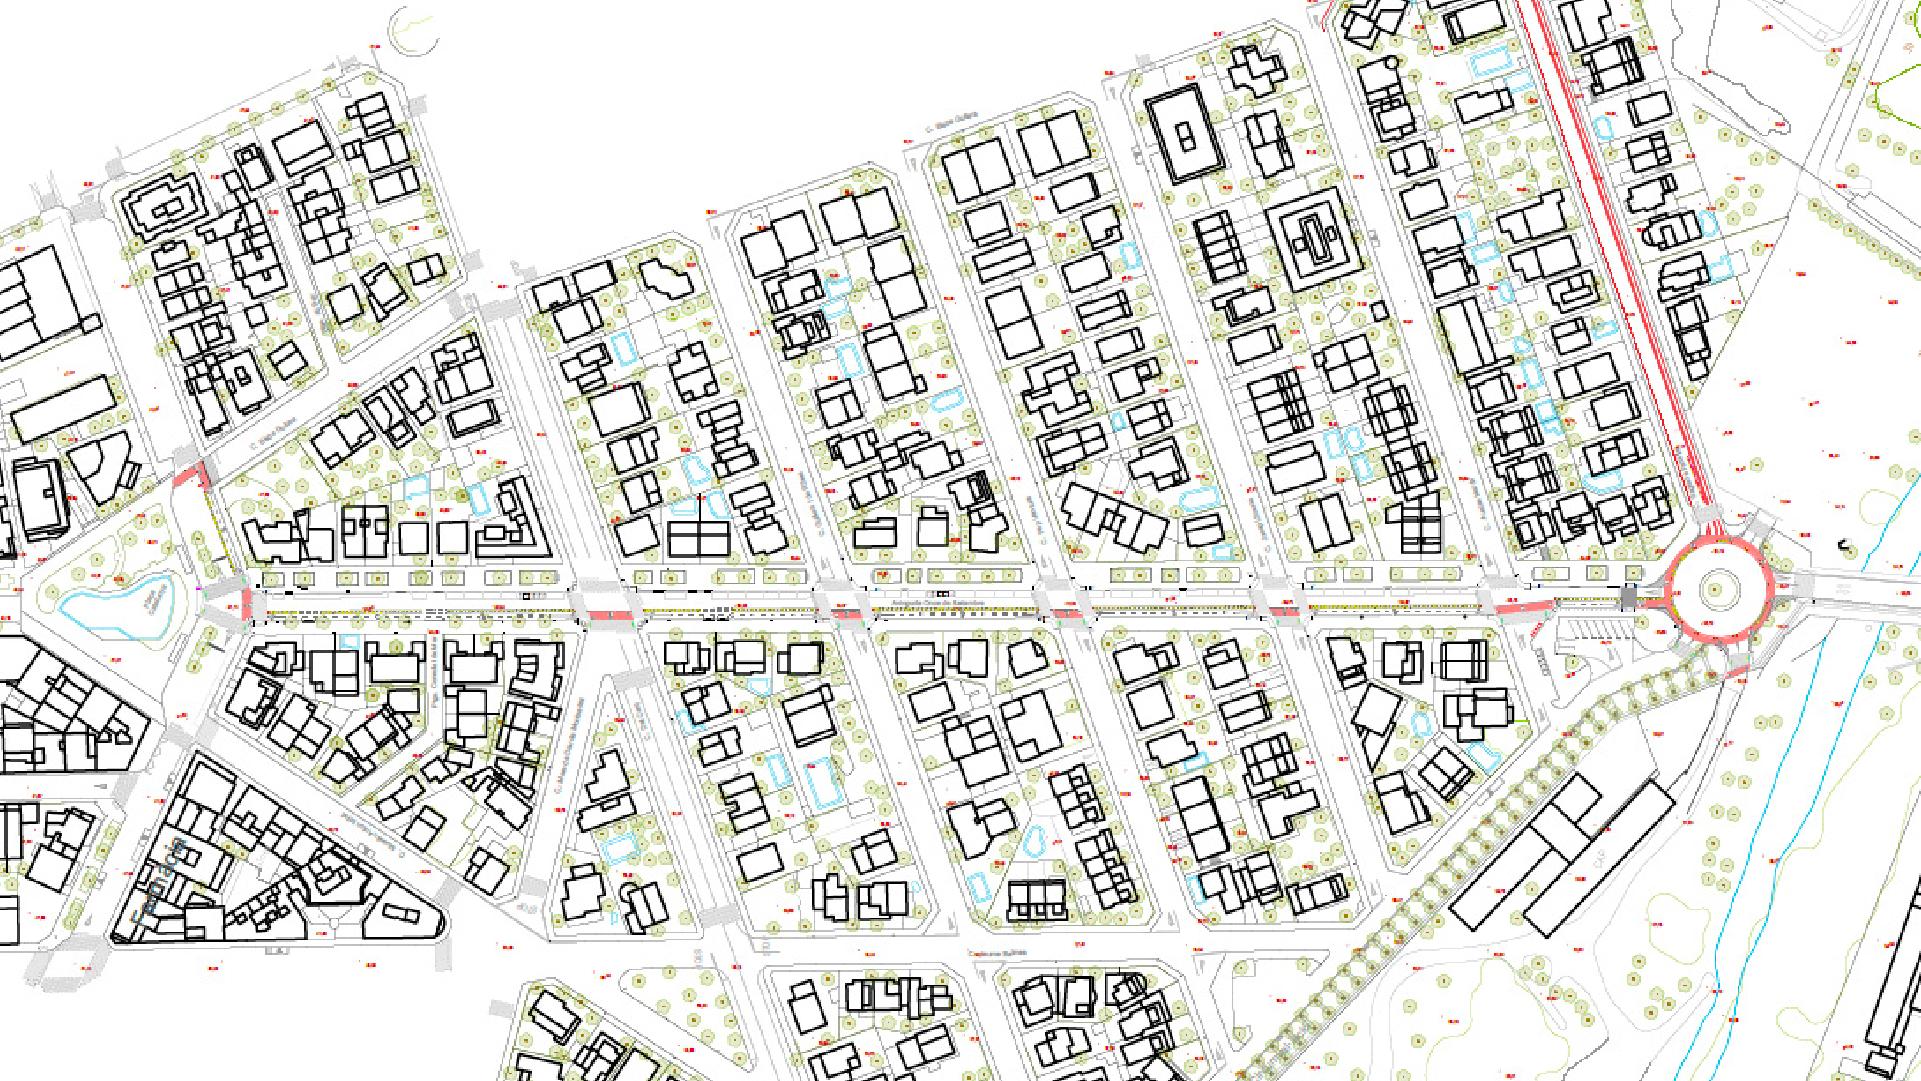 PE1811_PEX_StPereRibes_otos_Tipologies d'espai públic presents al barri copy